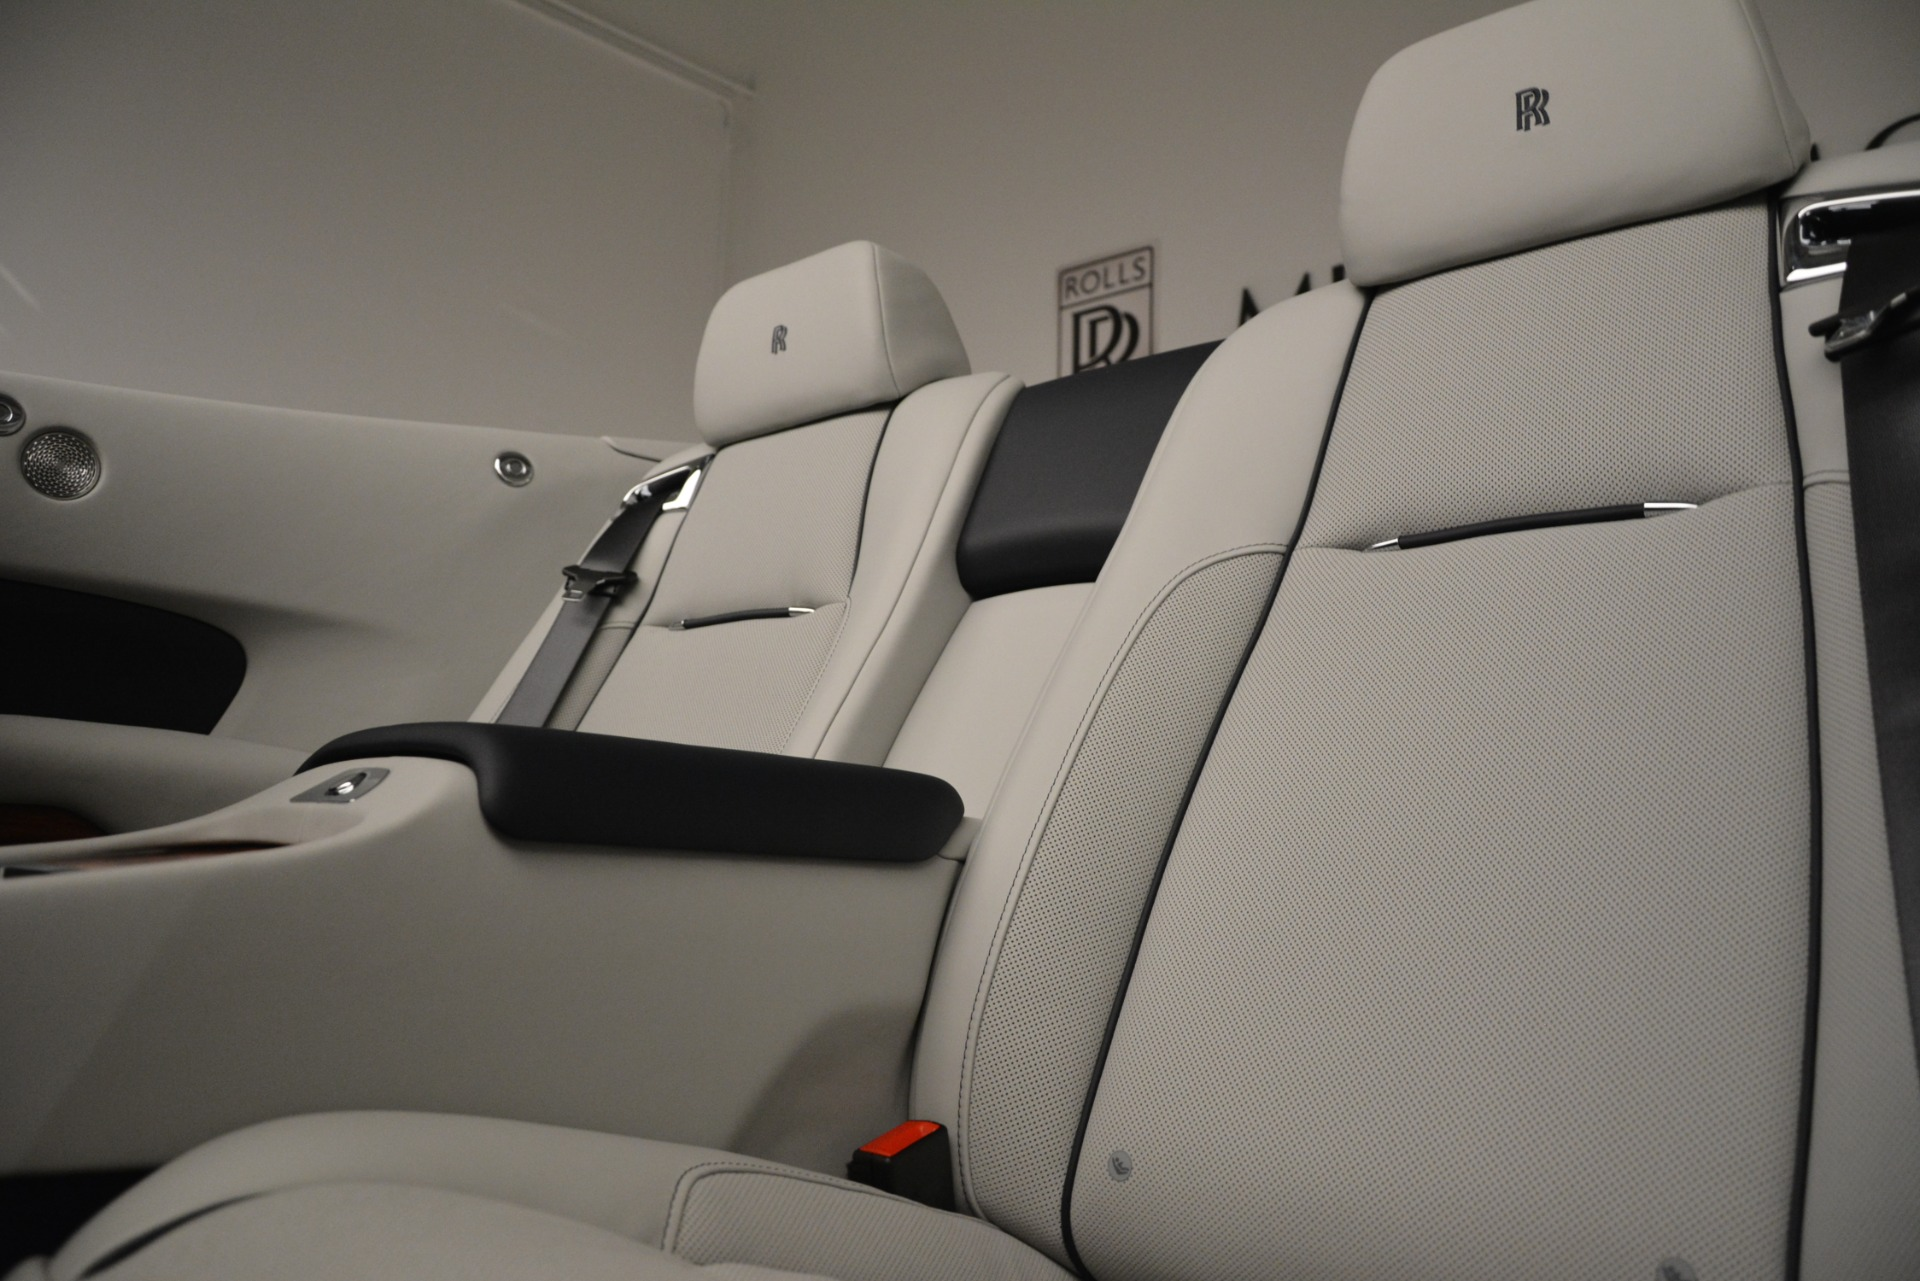 New 2019 Rolls-Royce Dawn  For Sale In Greenwich, CT 2974_p41